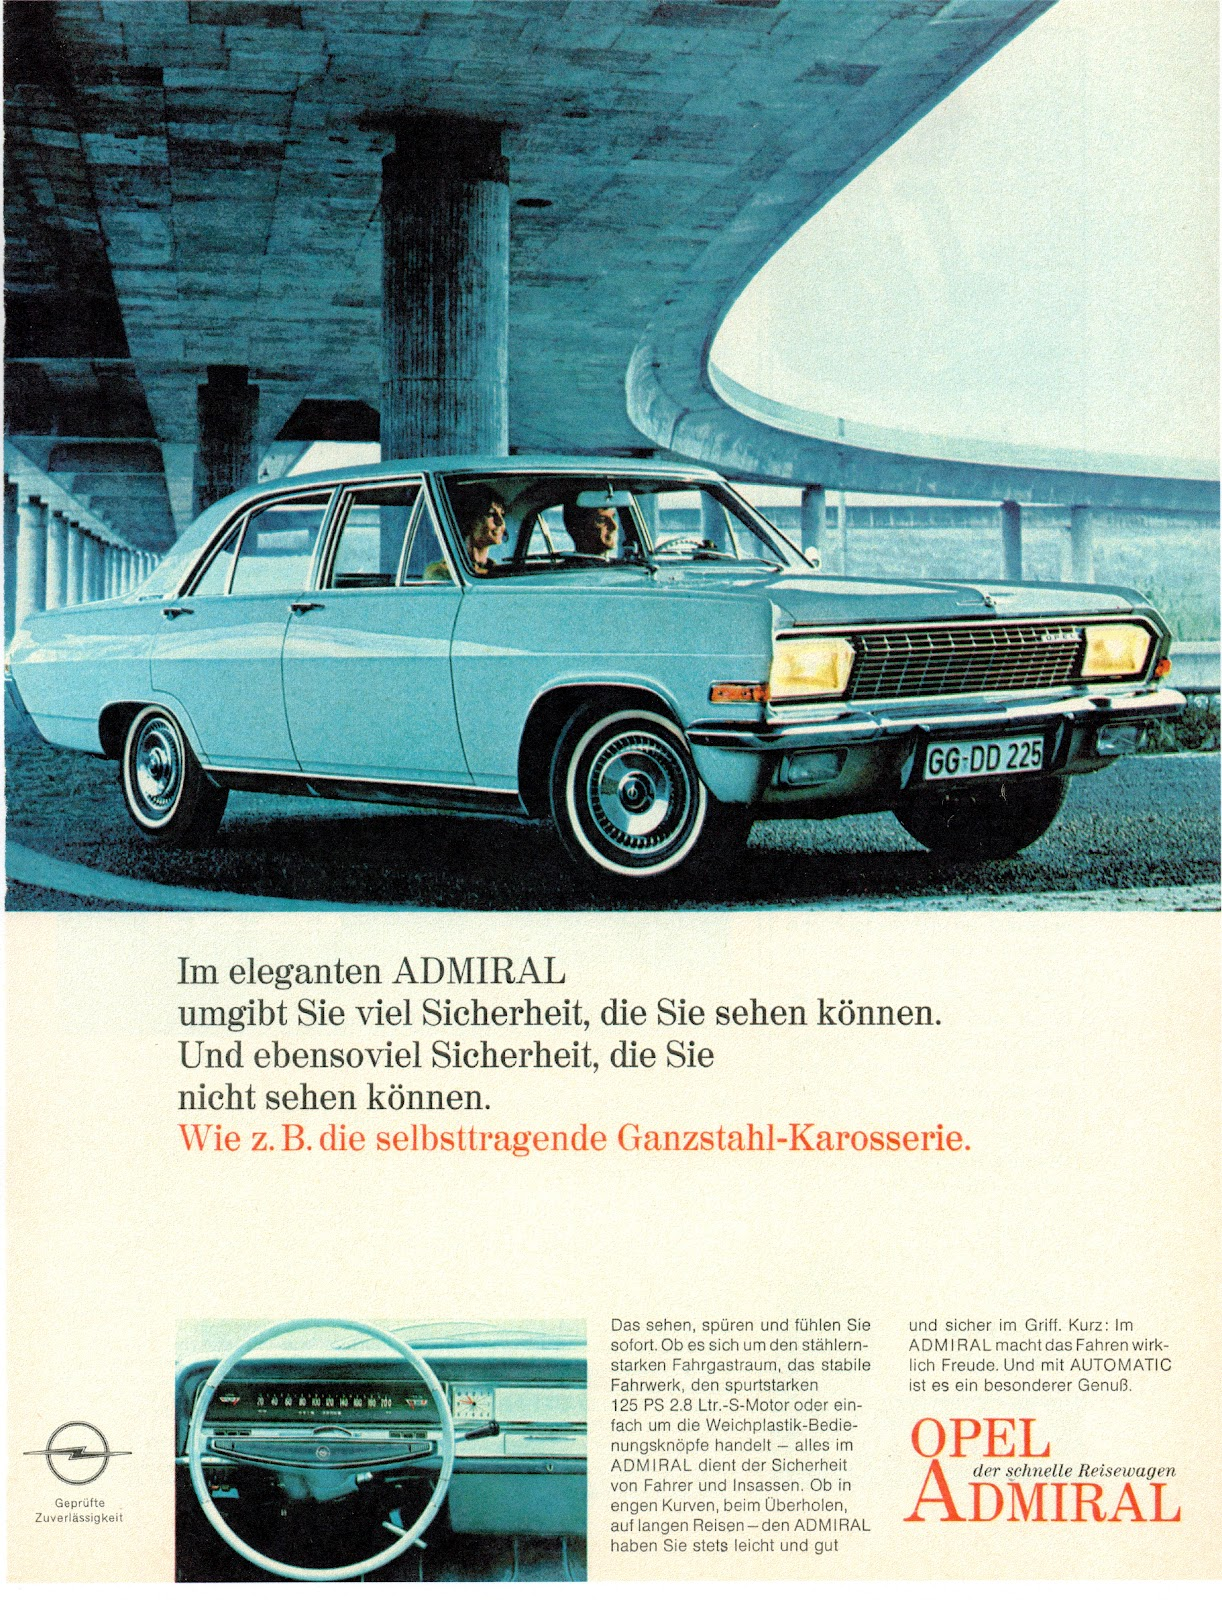 1967-Opel-Admiral-Germany.jpg